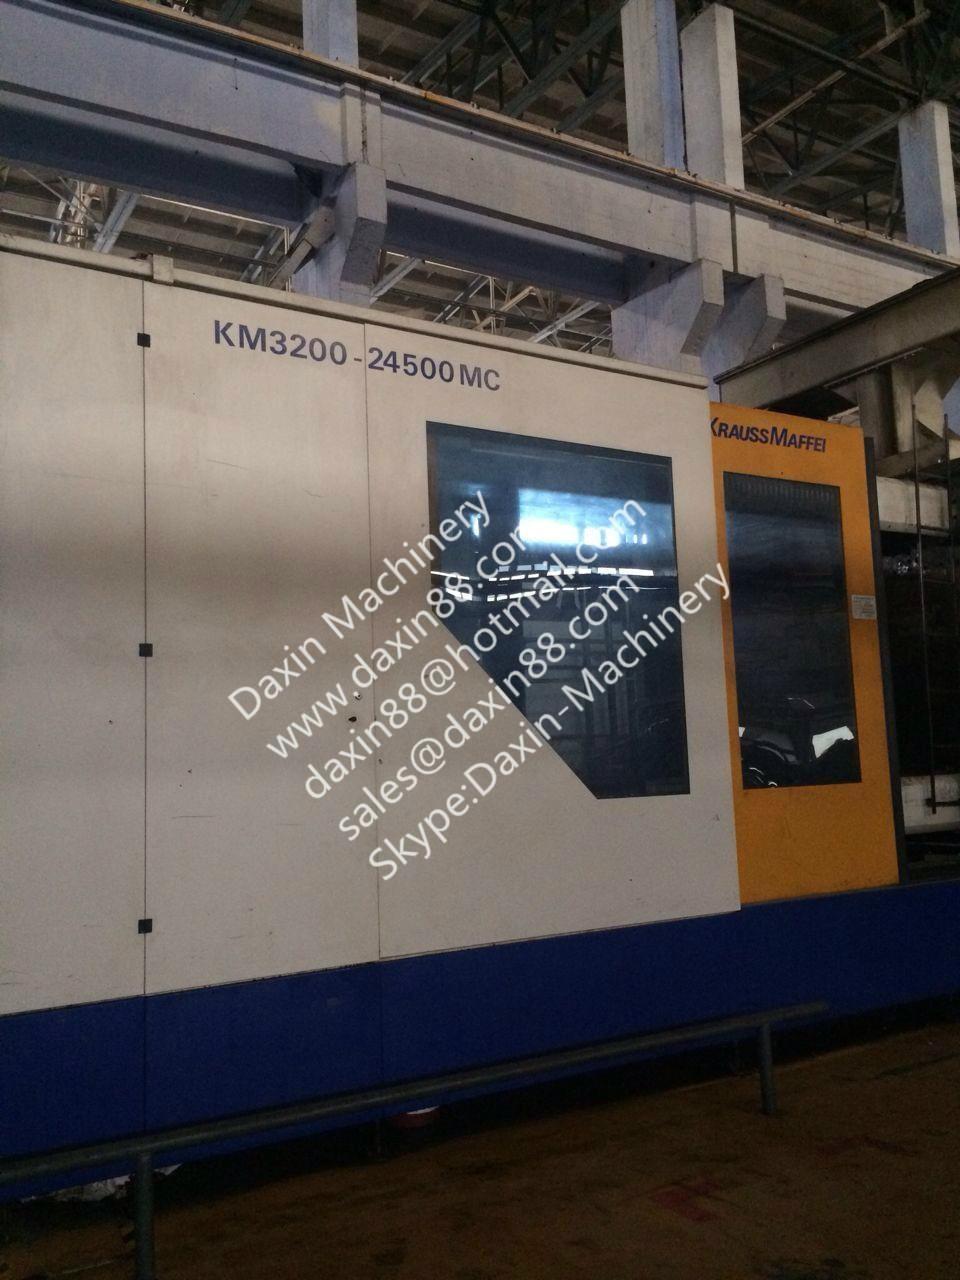 krauss maffei injection molding machine for sale